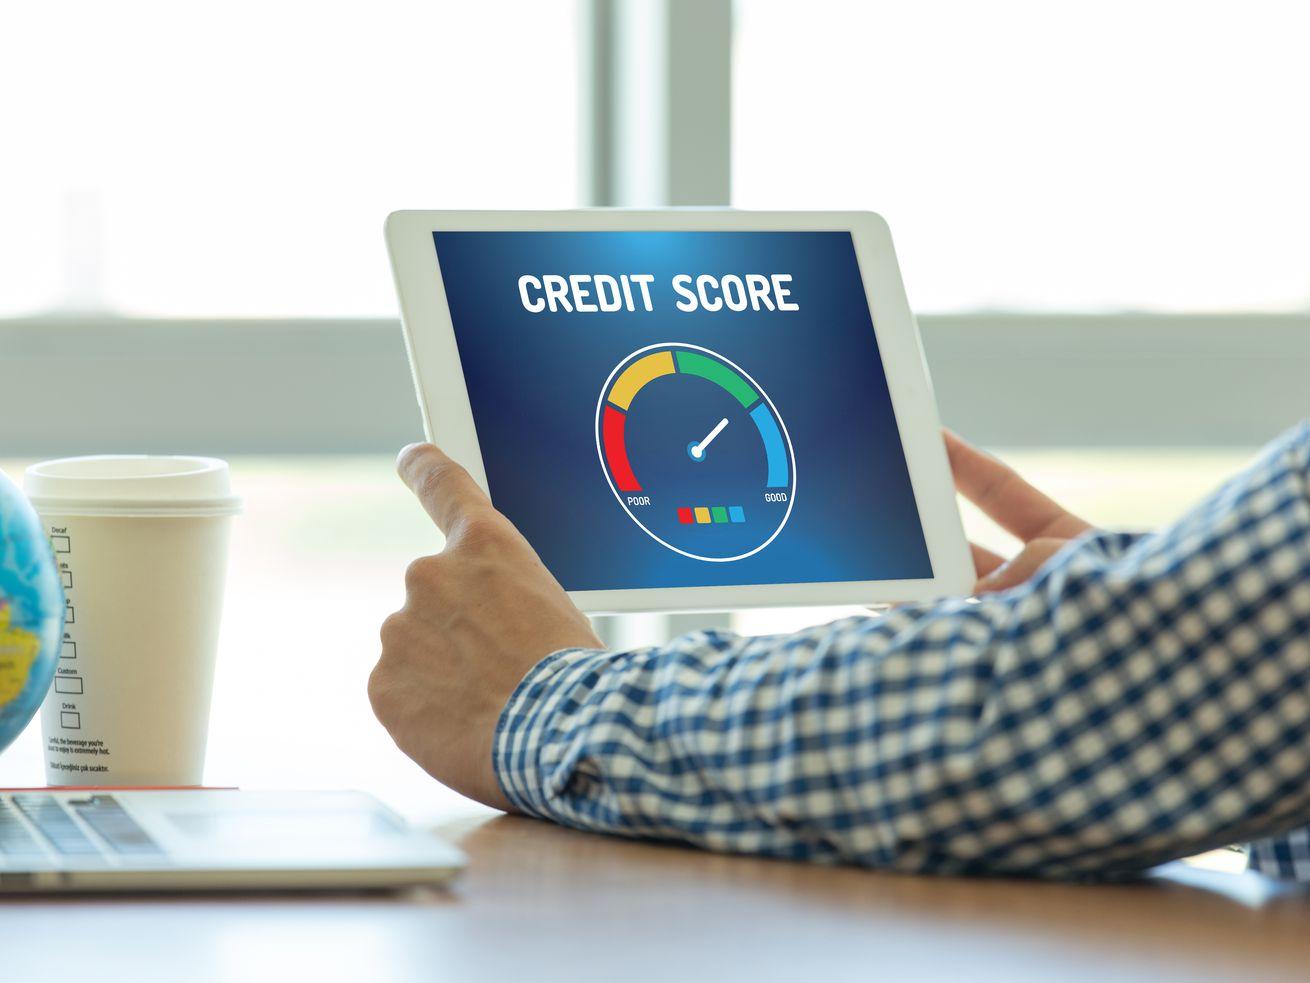 Average FICO credit score hits new high